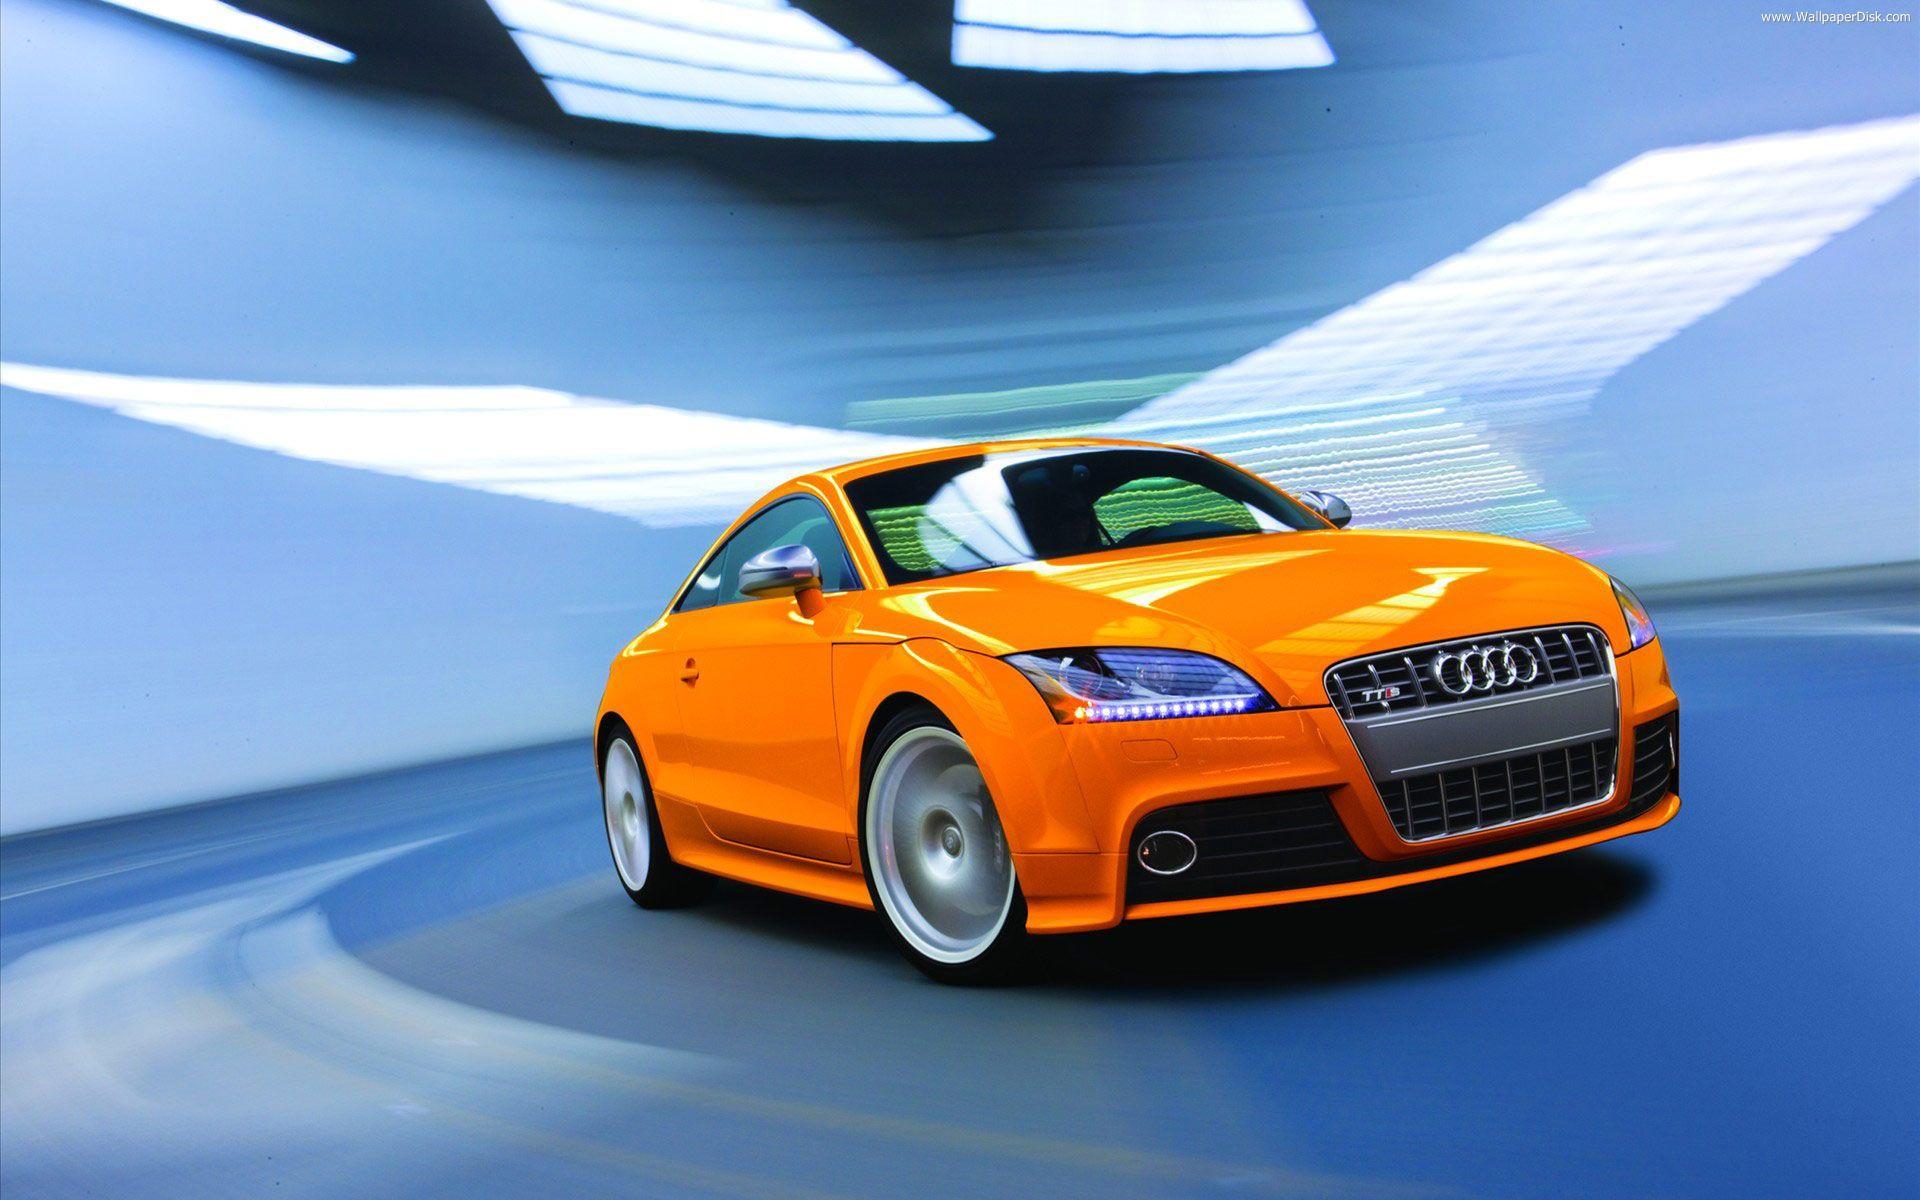 Orange Car To Set This Wallpaper As Your Desktop Wallpaper - Audi car finance